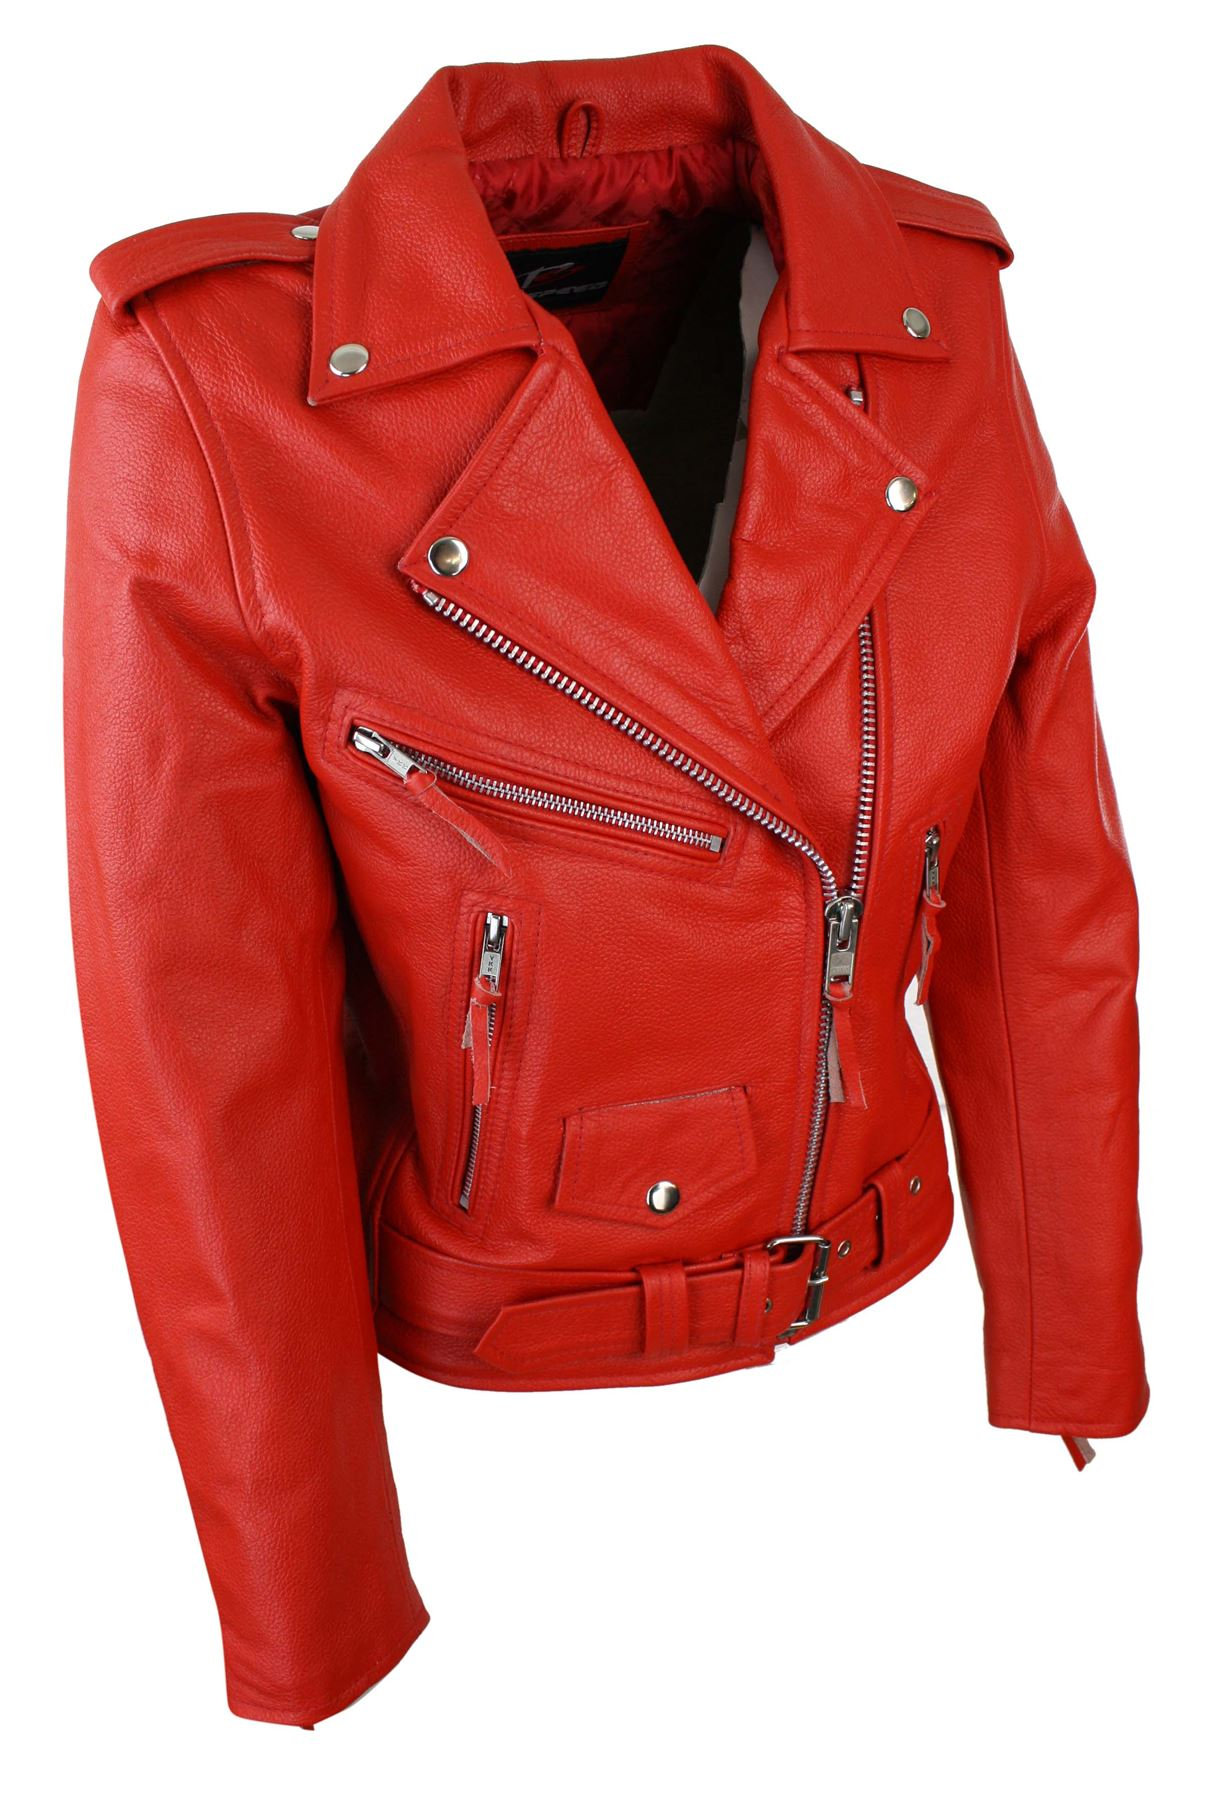 Ladies Women Classic Brando Biker Motorcycle Motorbike Hide Leather Jacket